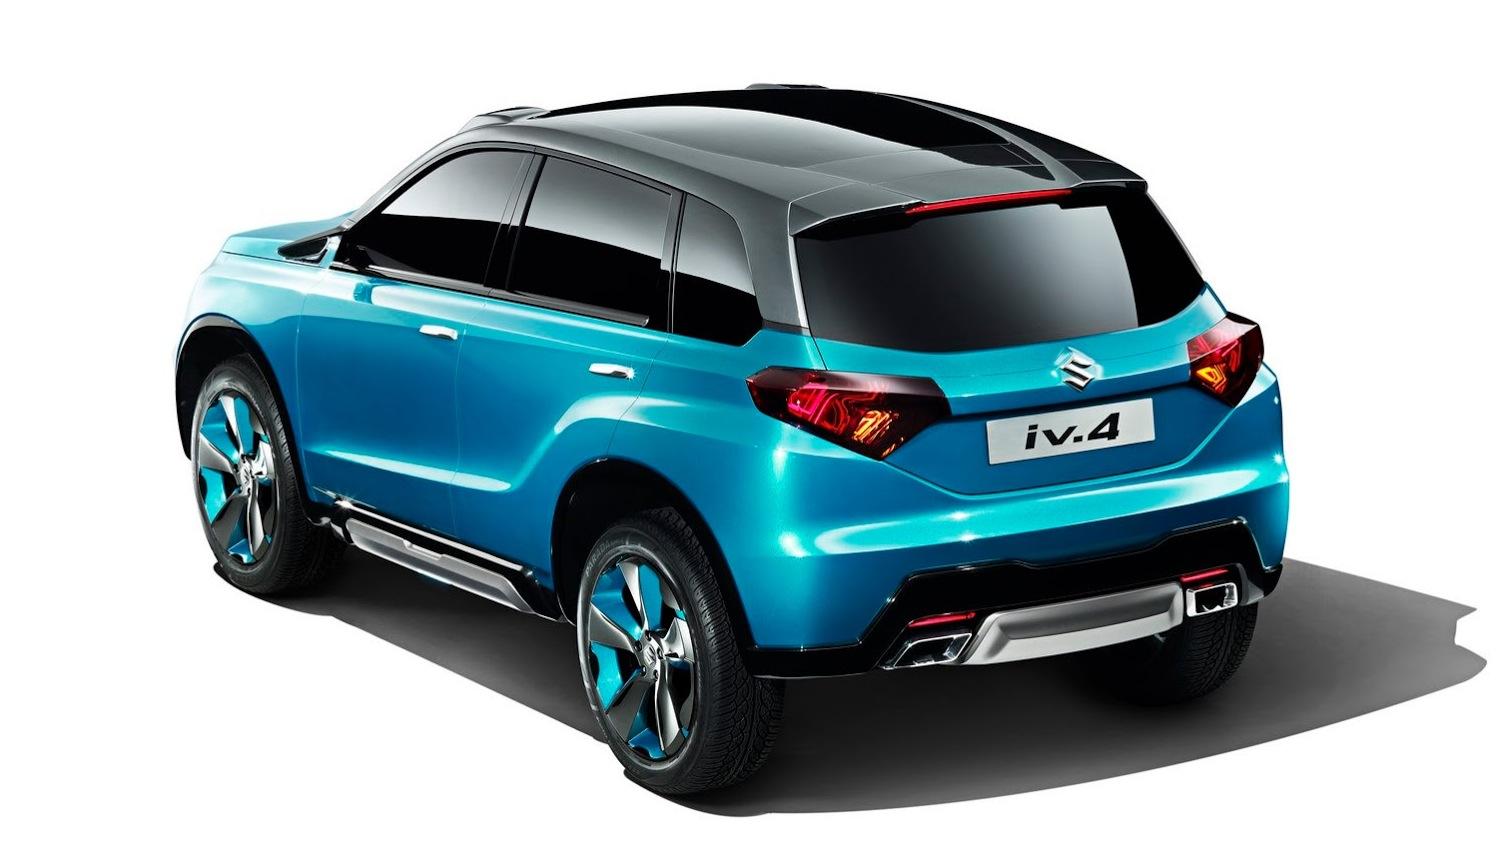 Suzuki iV-4 concept previews next-generation Jimny | CarAdvice